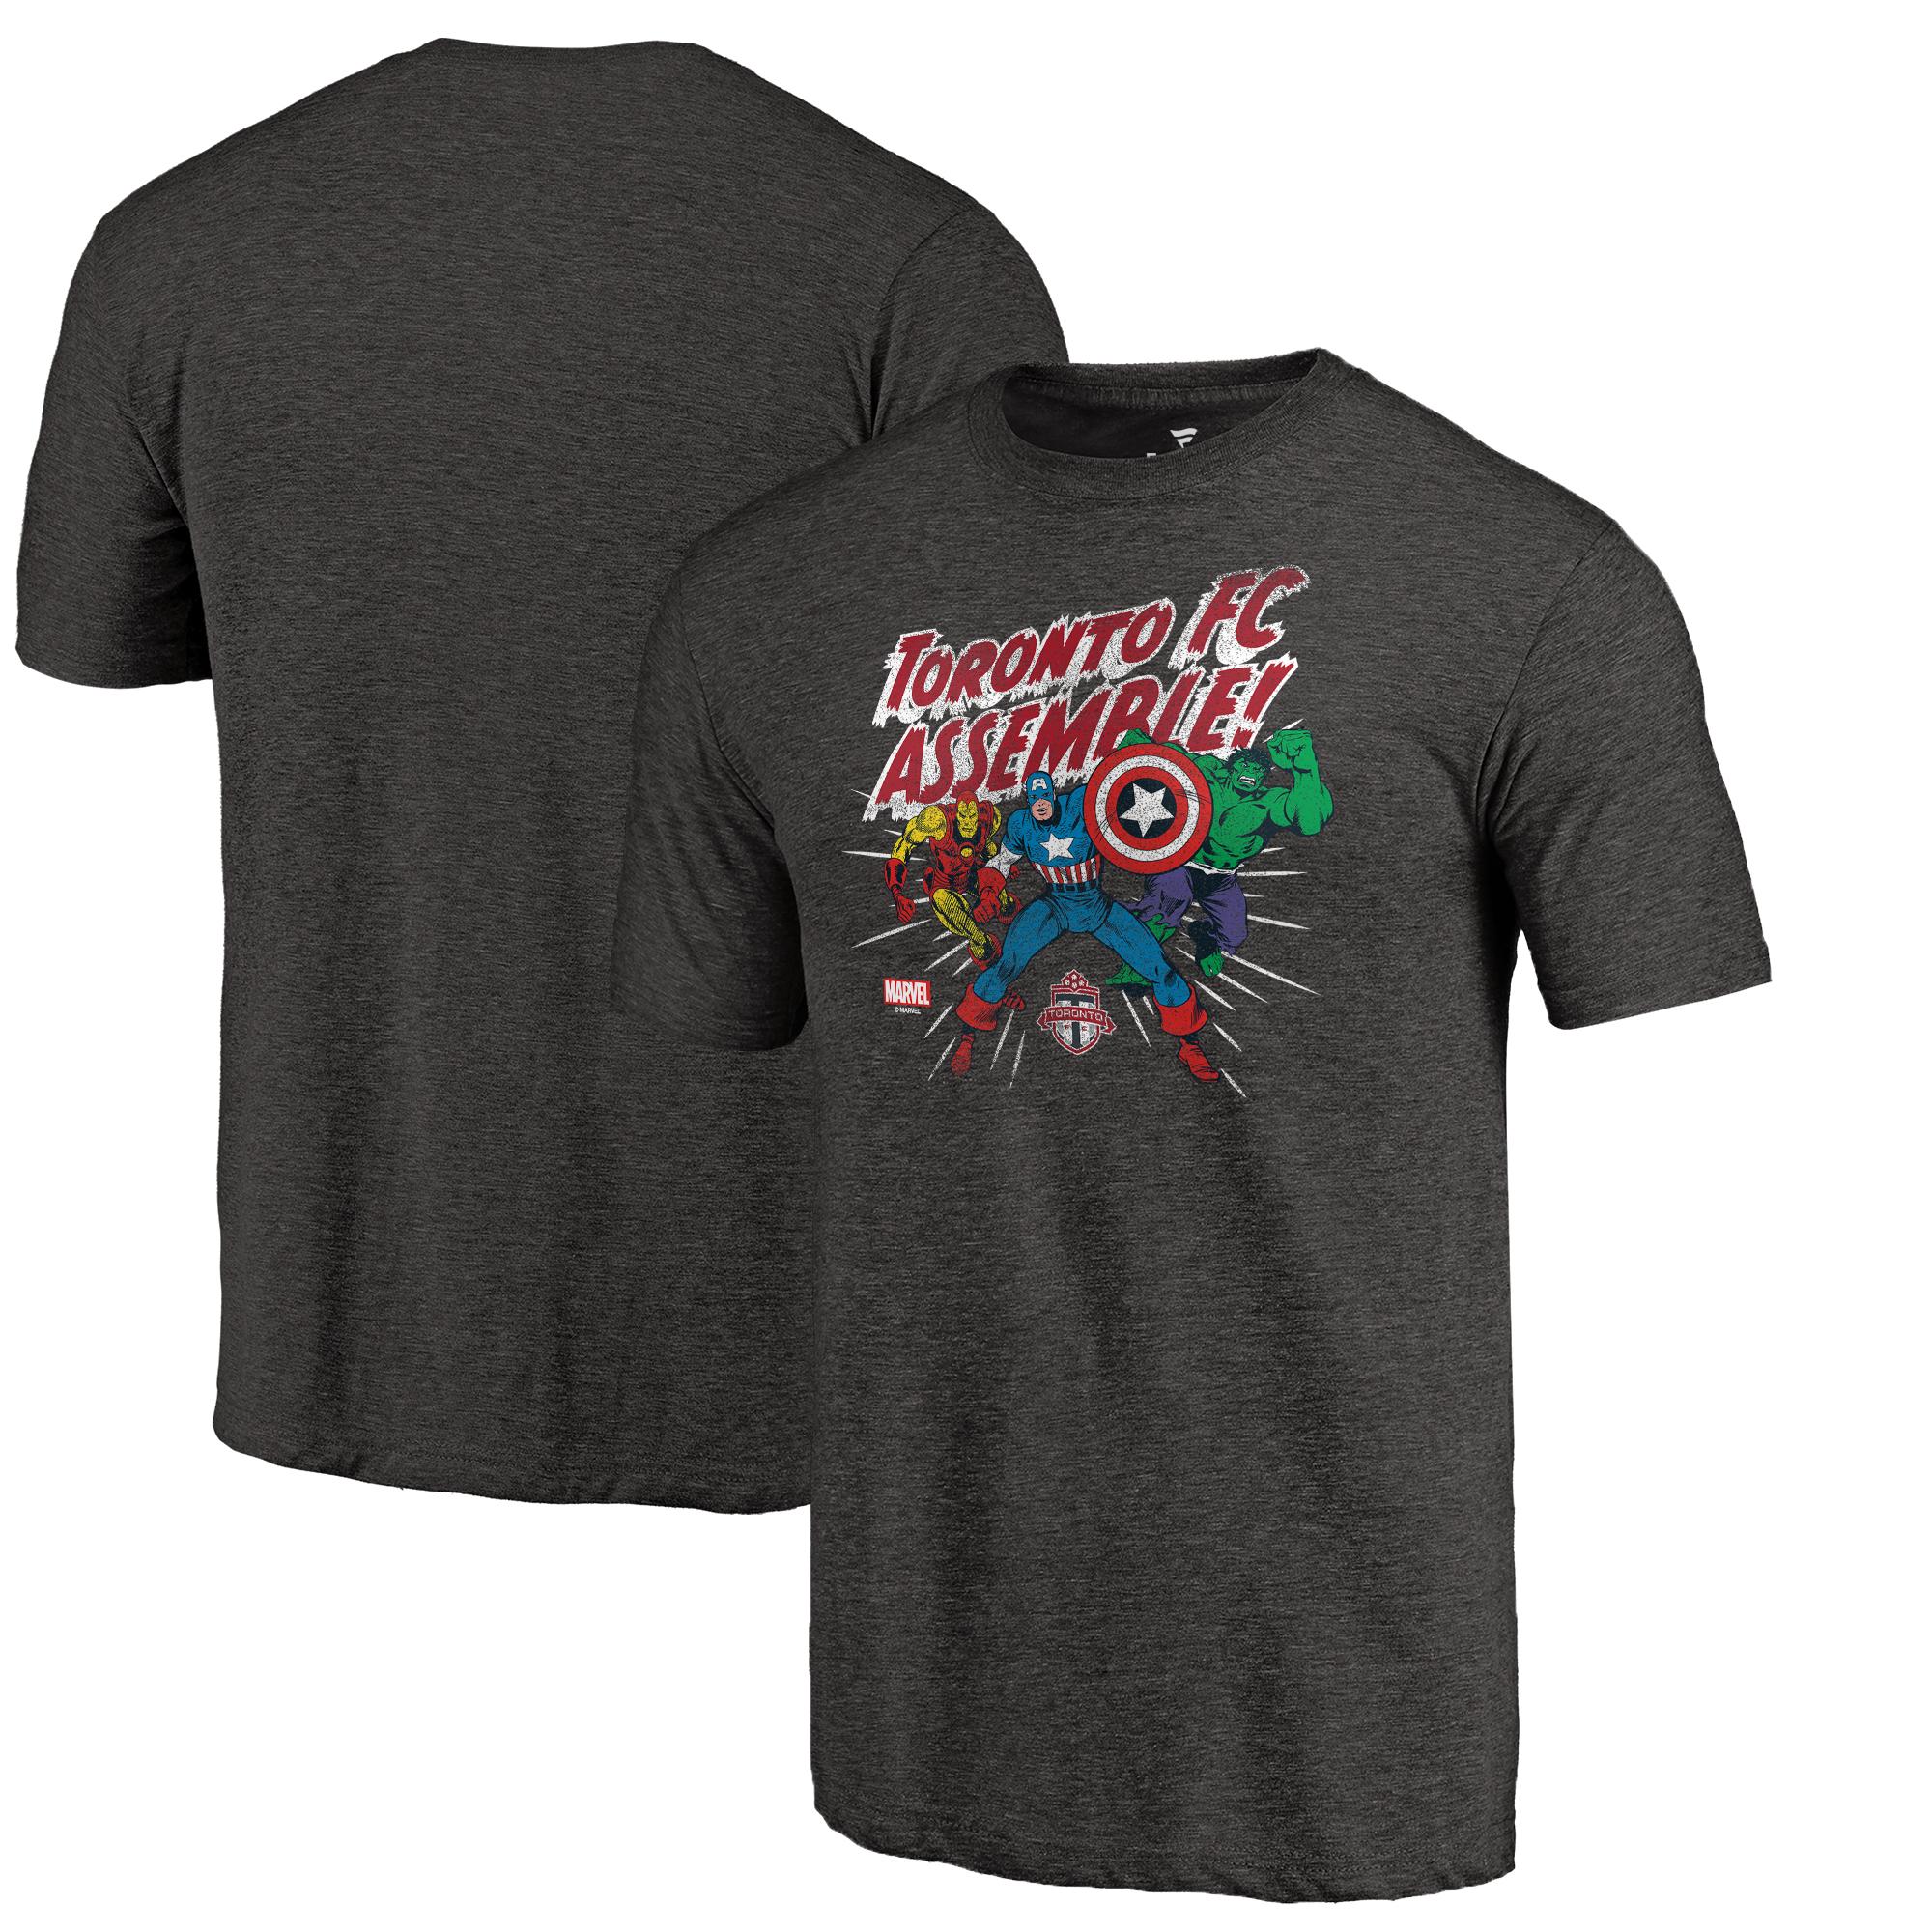 Toronto FC Fanatics Branded Marvel Avengers Assemble Tri-Blend T-Shirt - Black